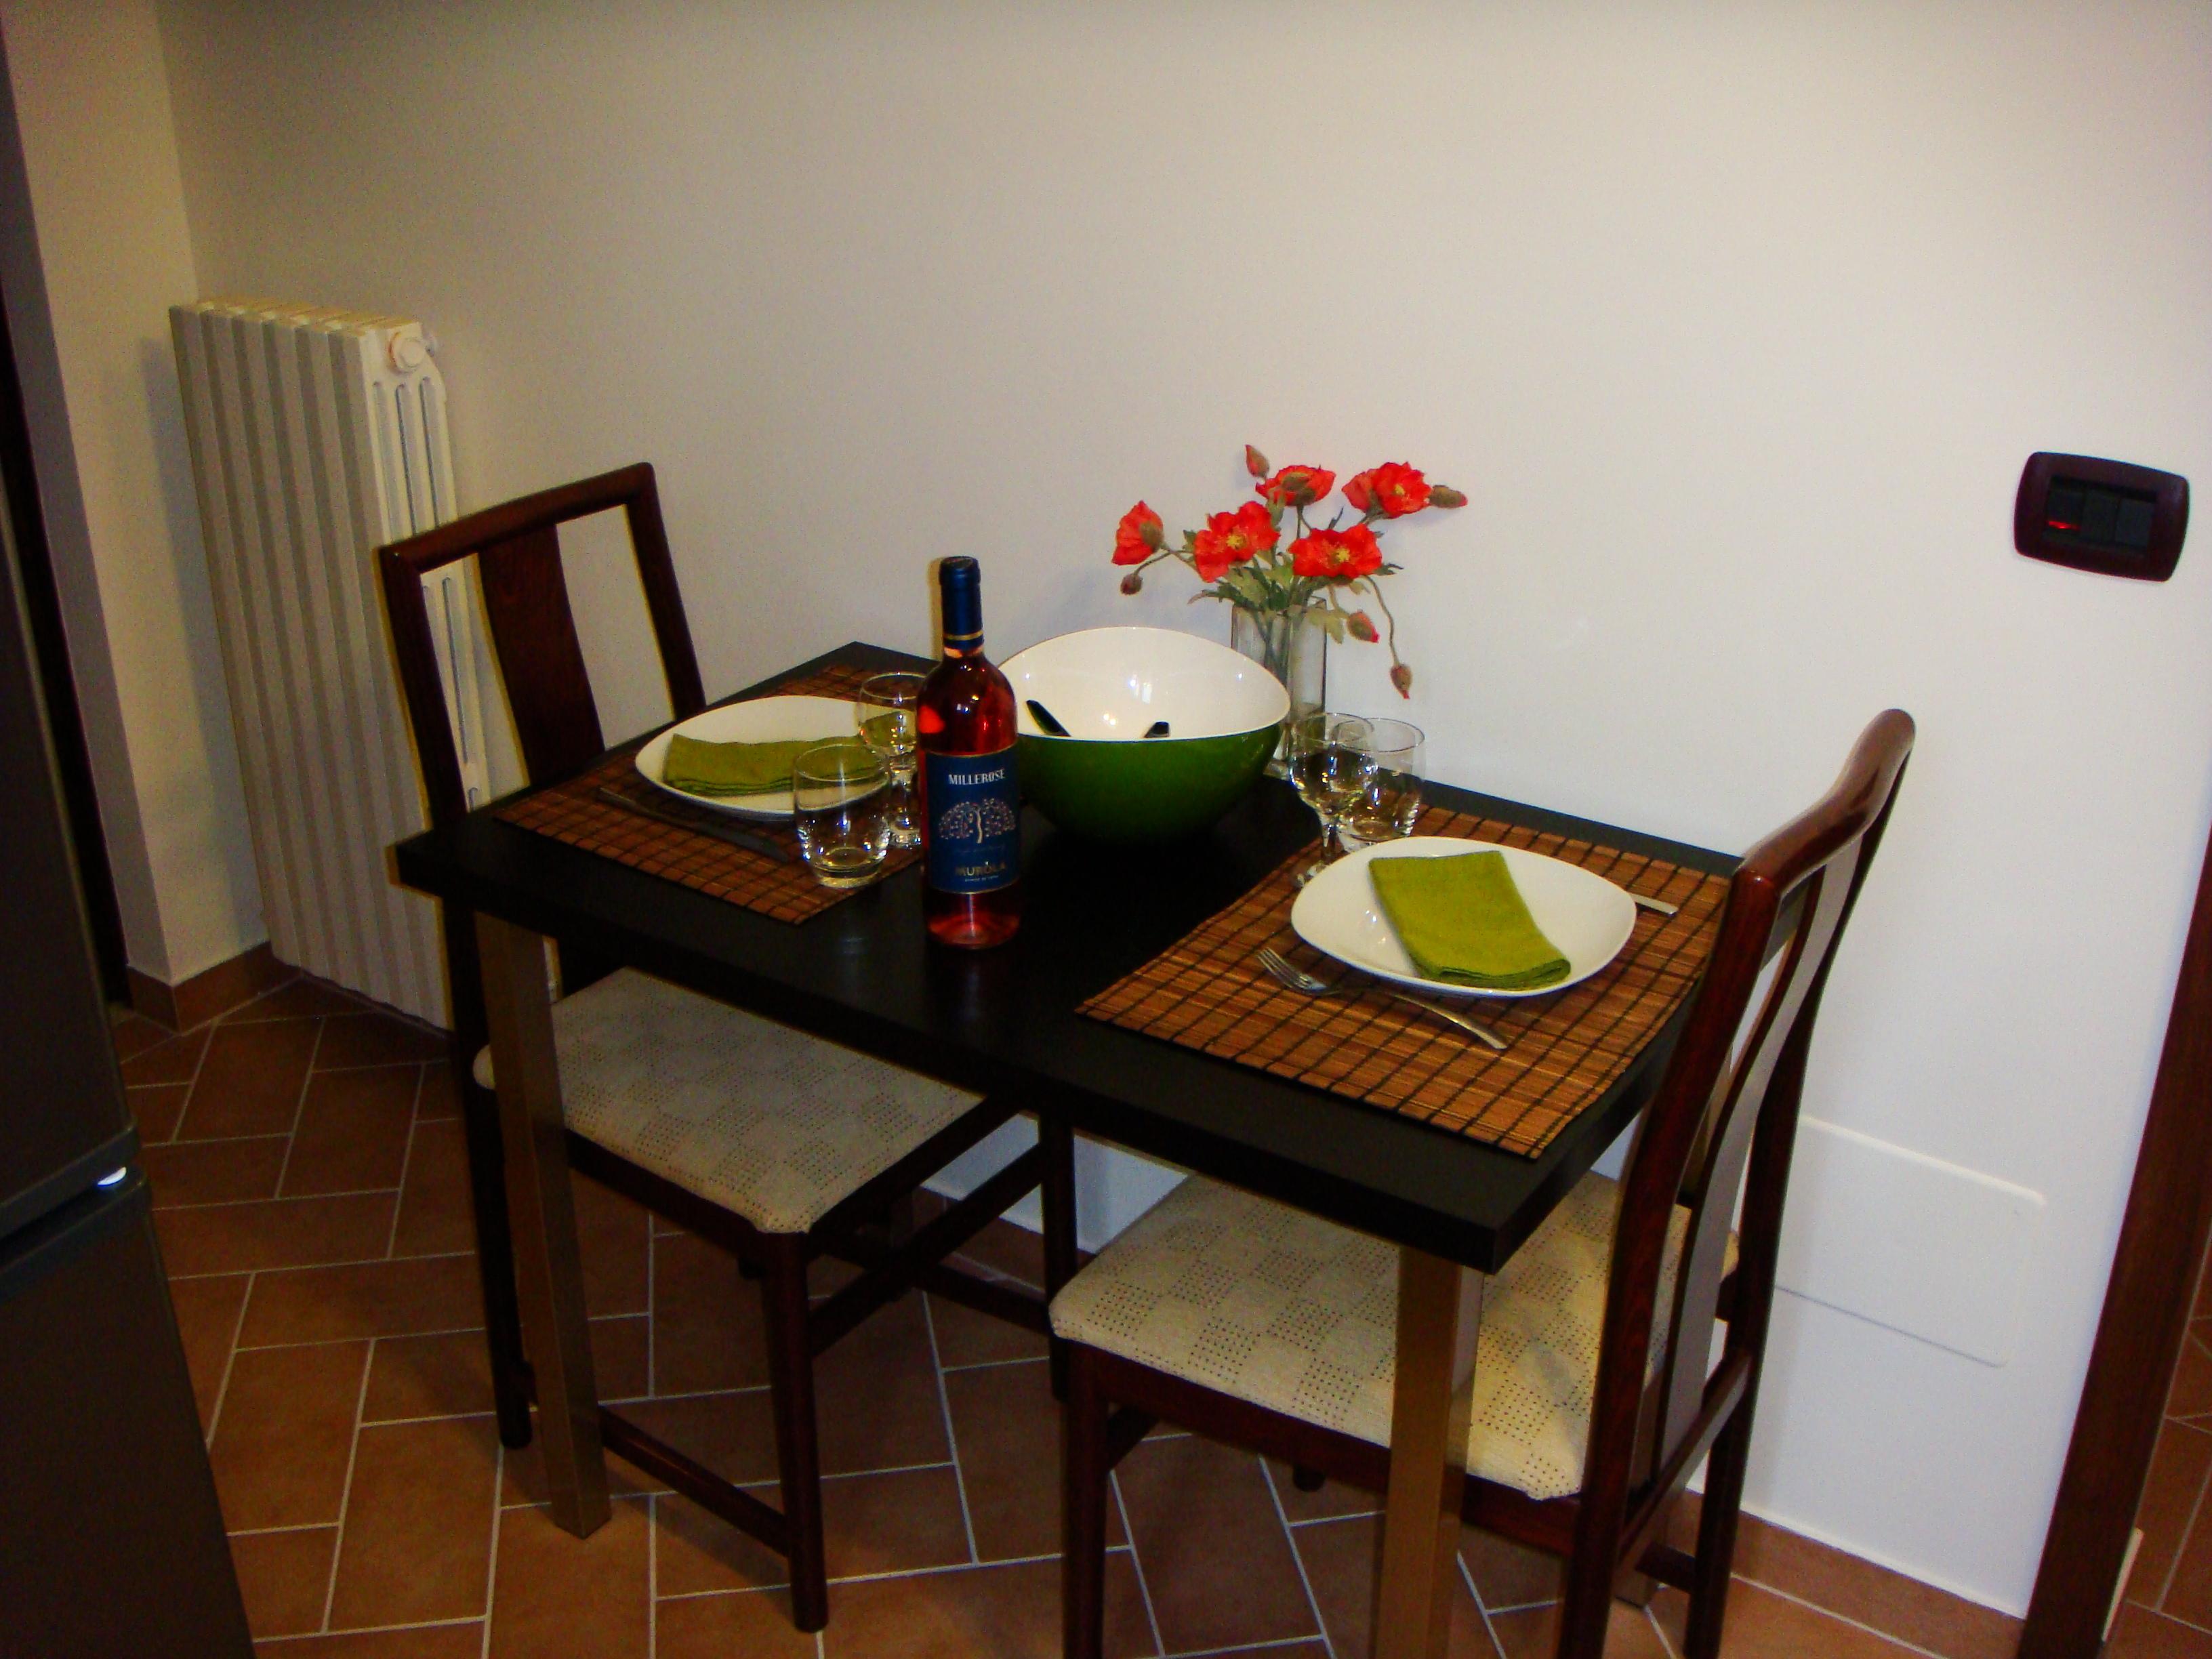 Villa Miramonti-Cardellino dining